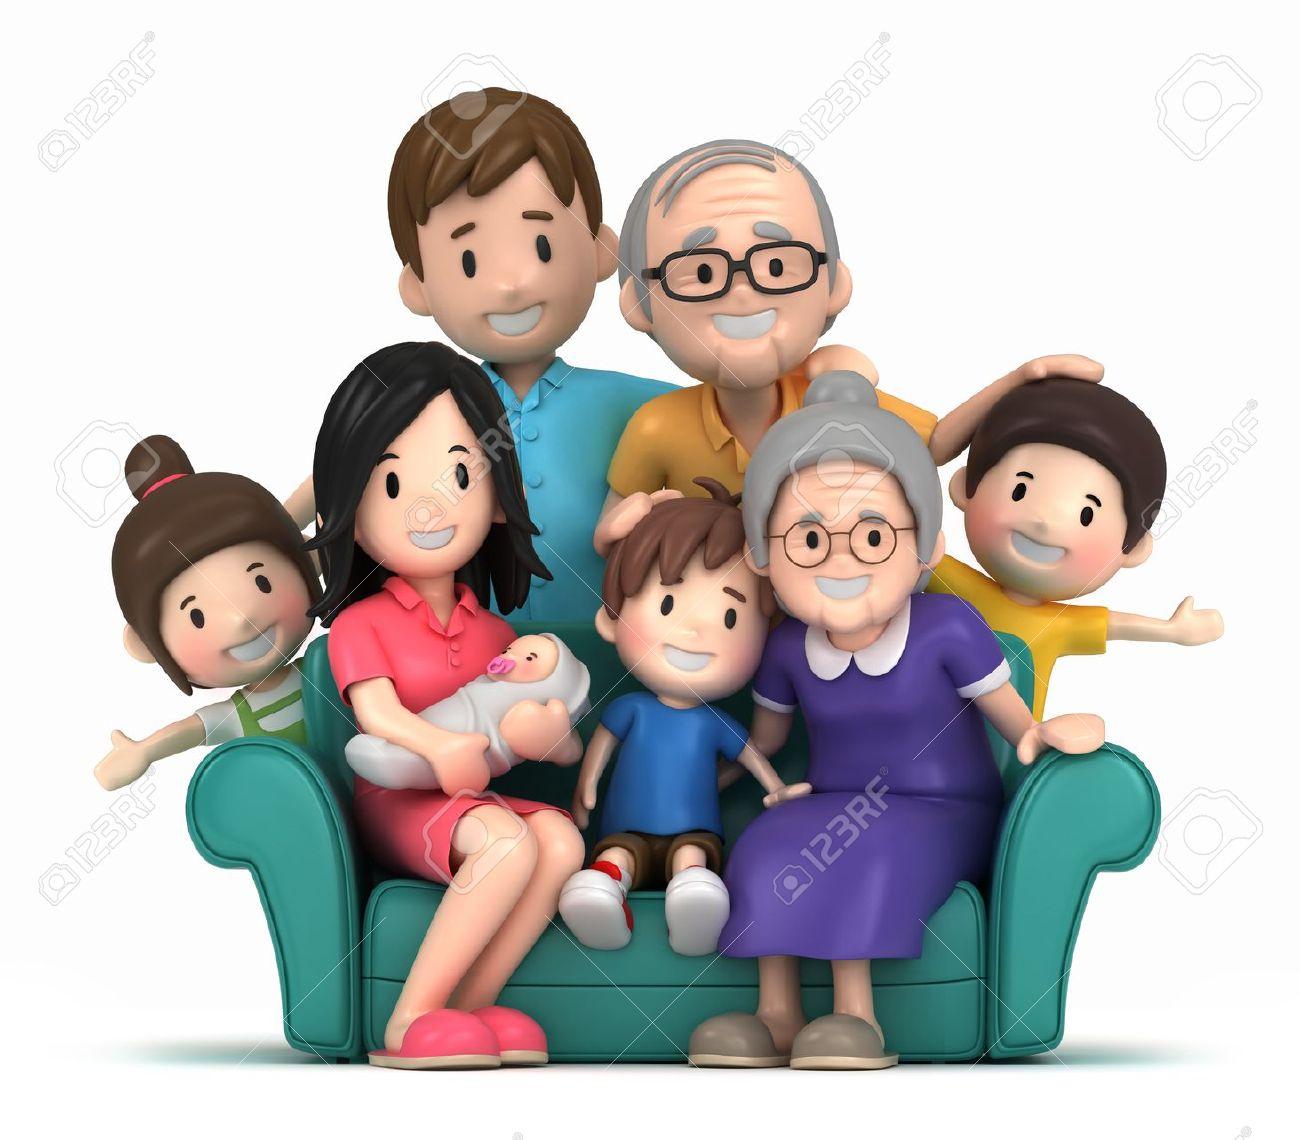 Family Portrait Cliparts Stock .-Family Portrait Cliparts Stock .-8